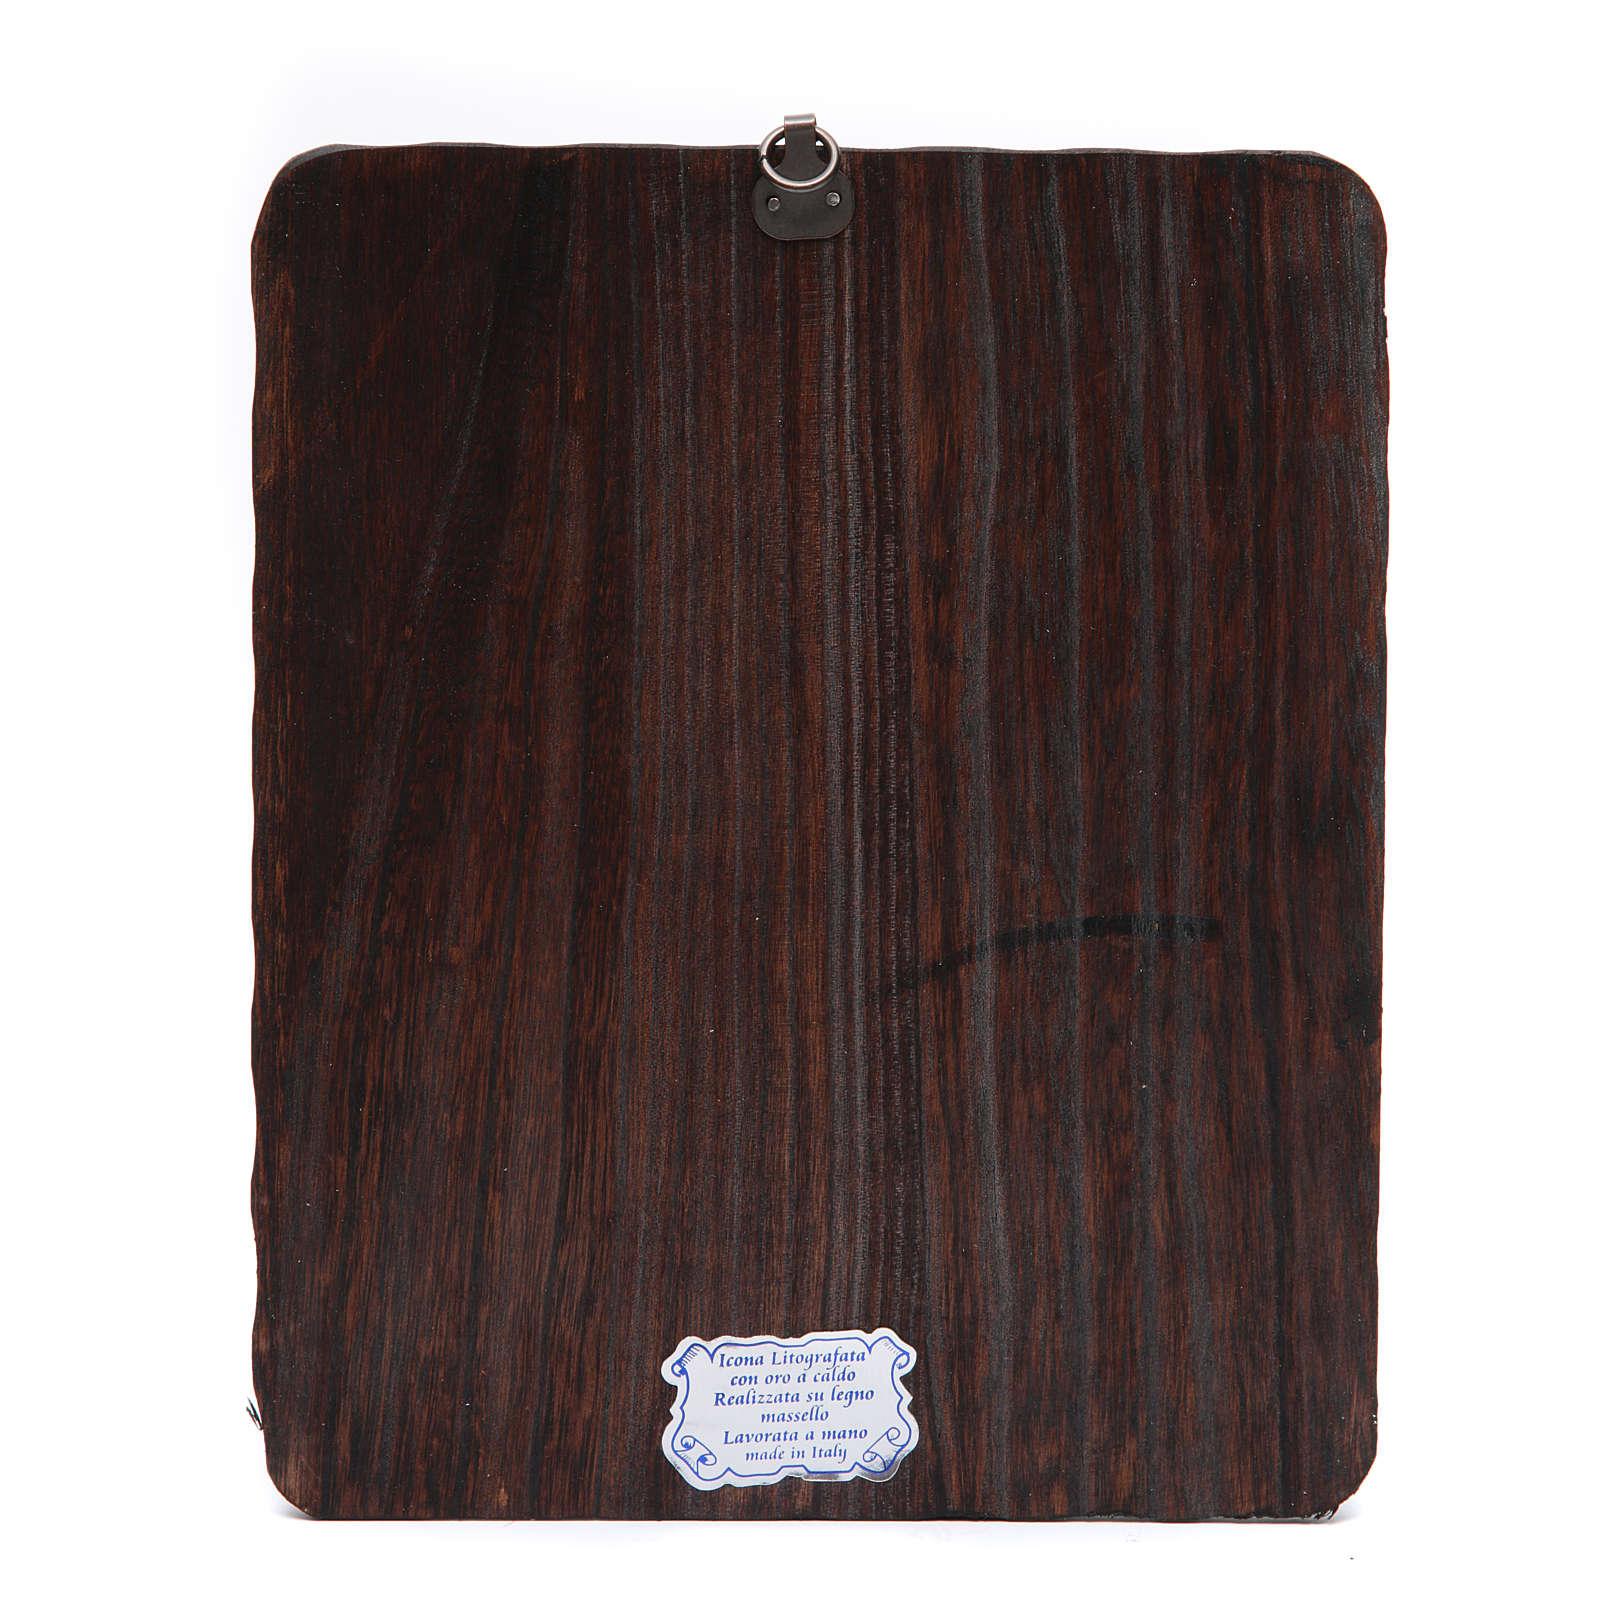 Quadrinho madeira maciça Cristo Misericordioso litografia 4